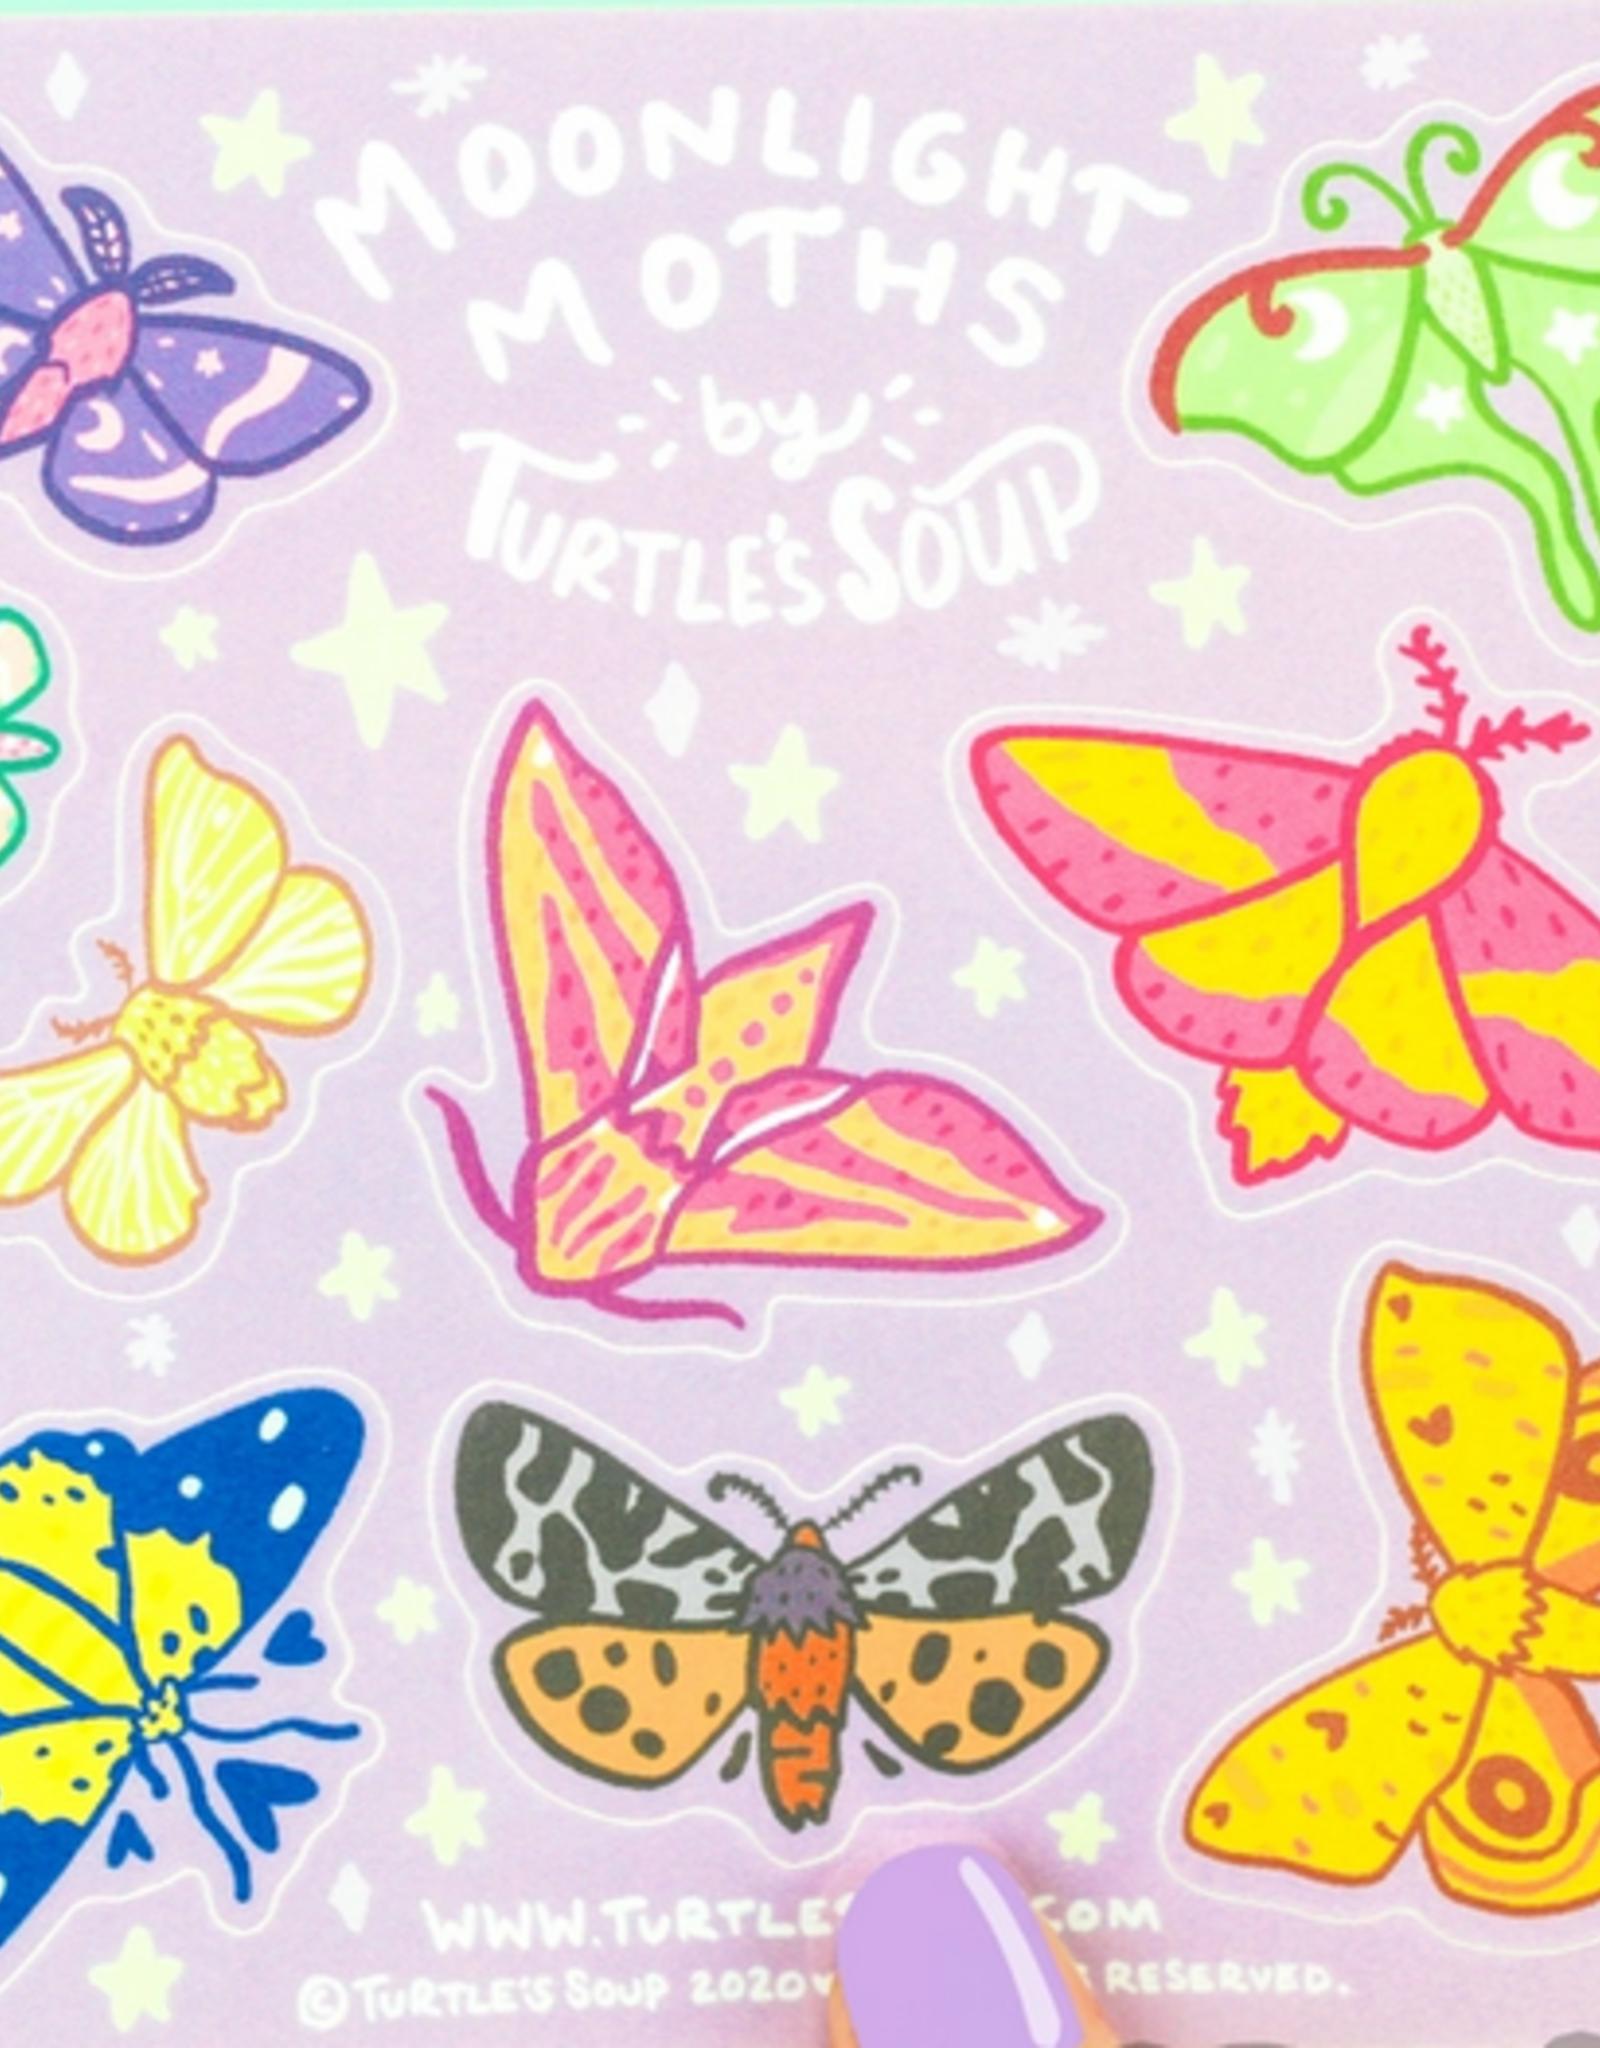 Turtle's Soup Moonlight Moths Vinyl Sticker Sheet